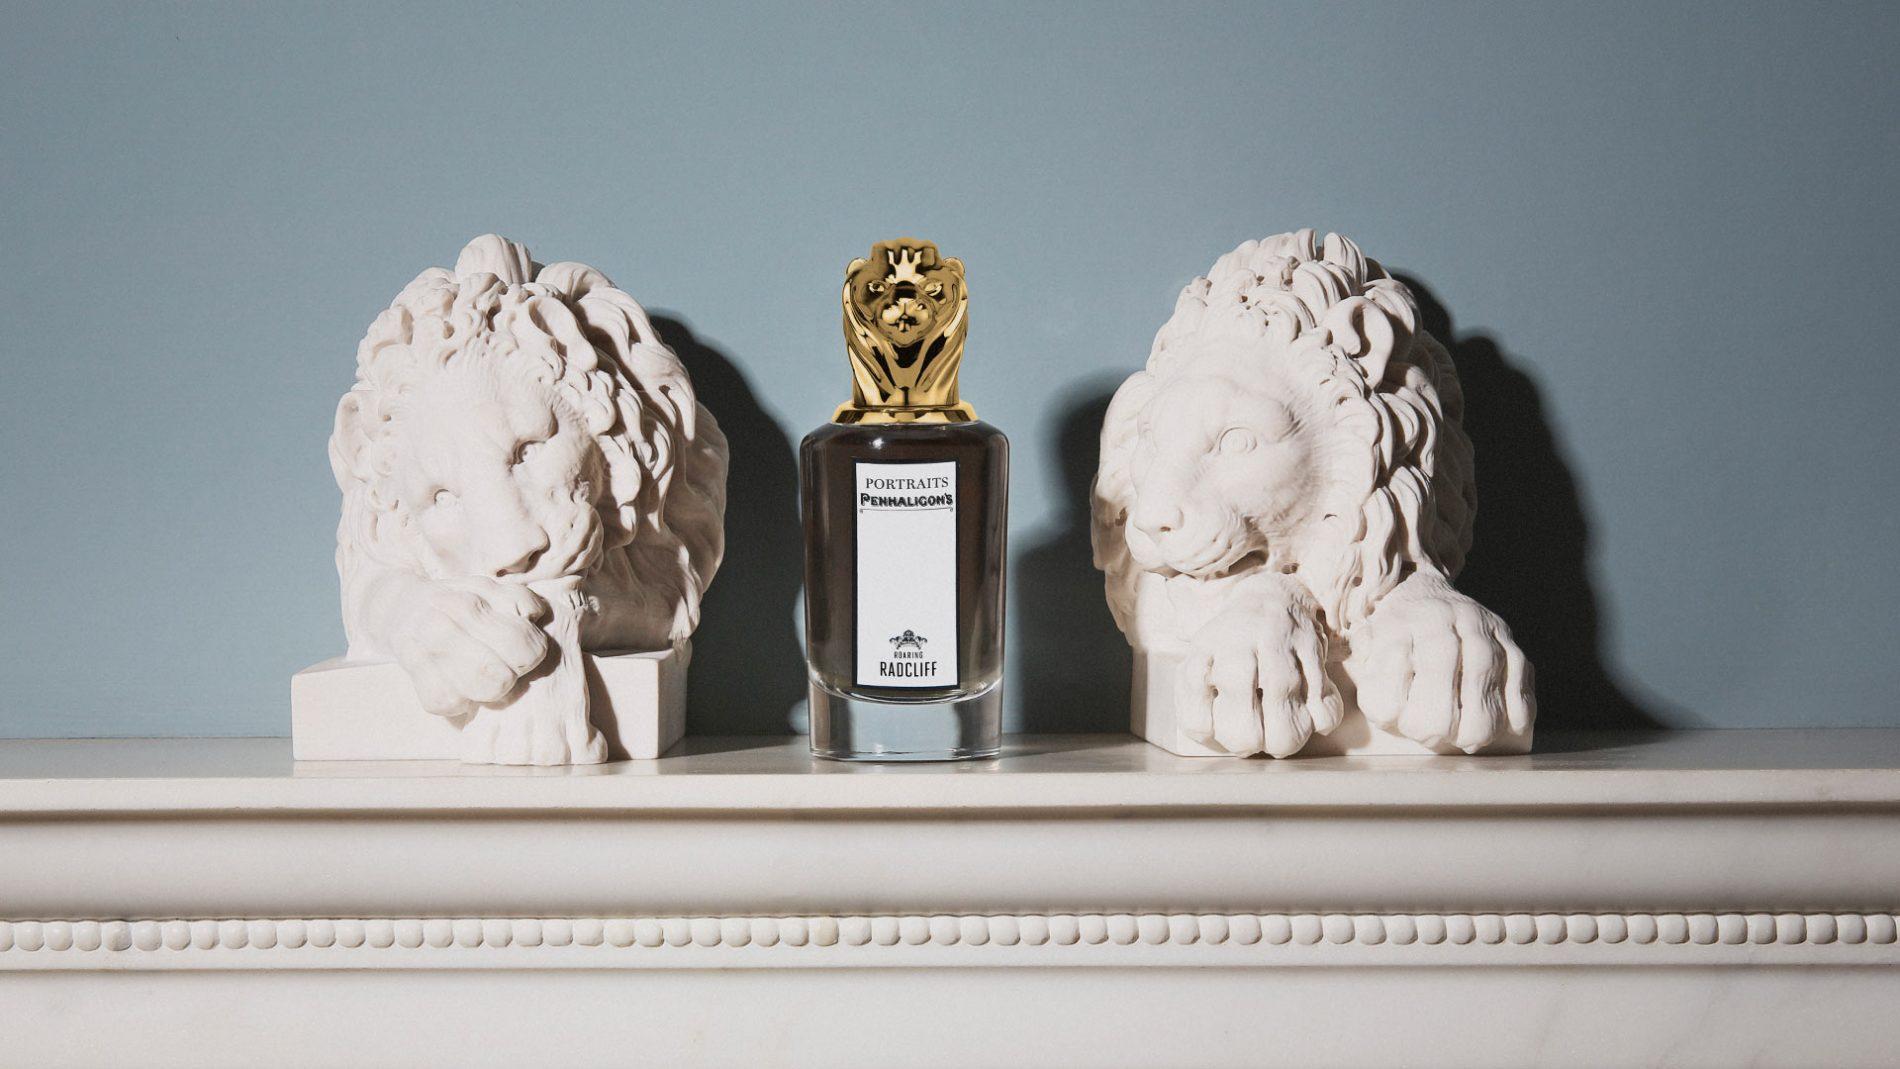 El Corte Inglés Designer Fragrance Penhaligons Portraits Rutherford